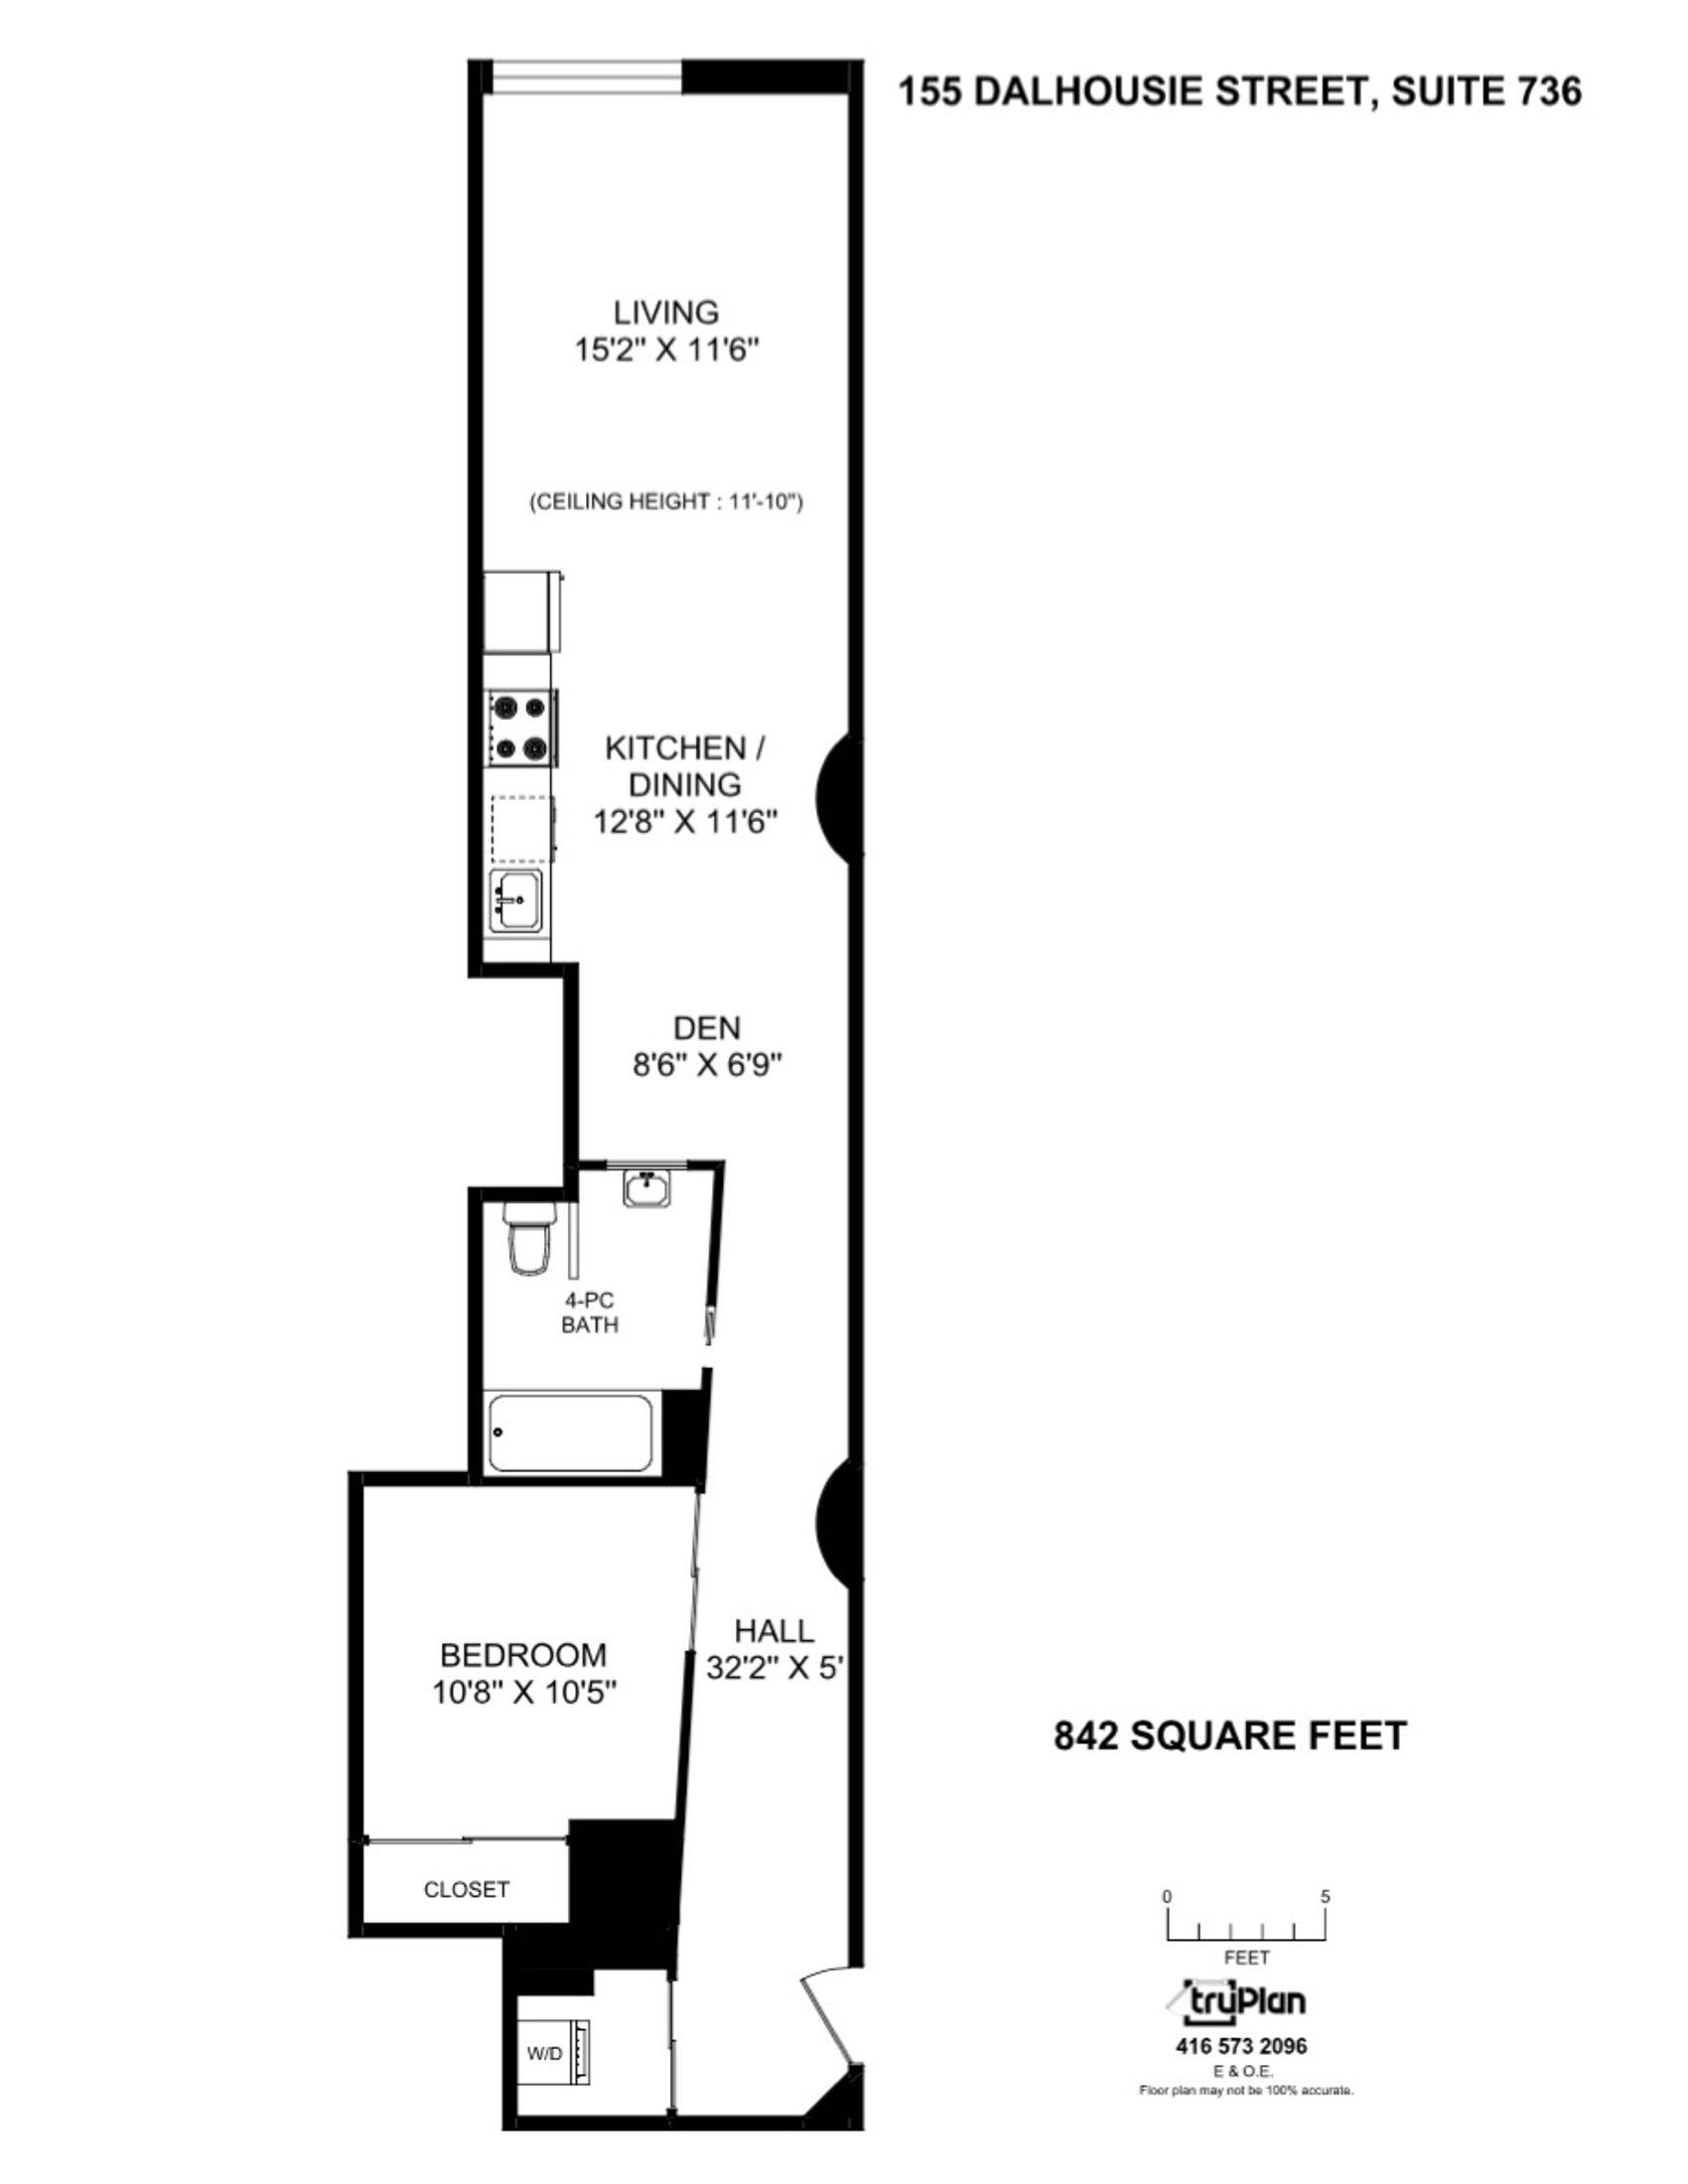 736-155 Dalhousie Floor Plan